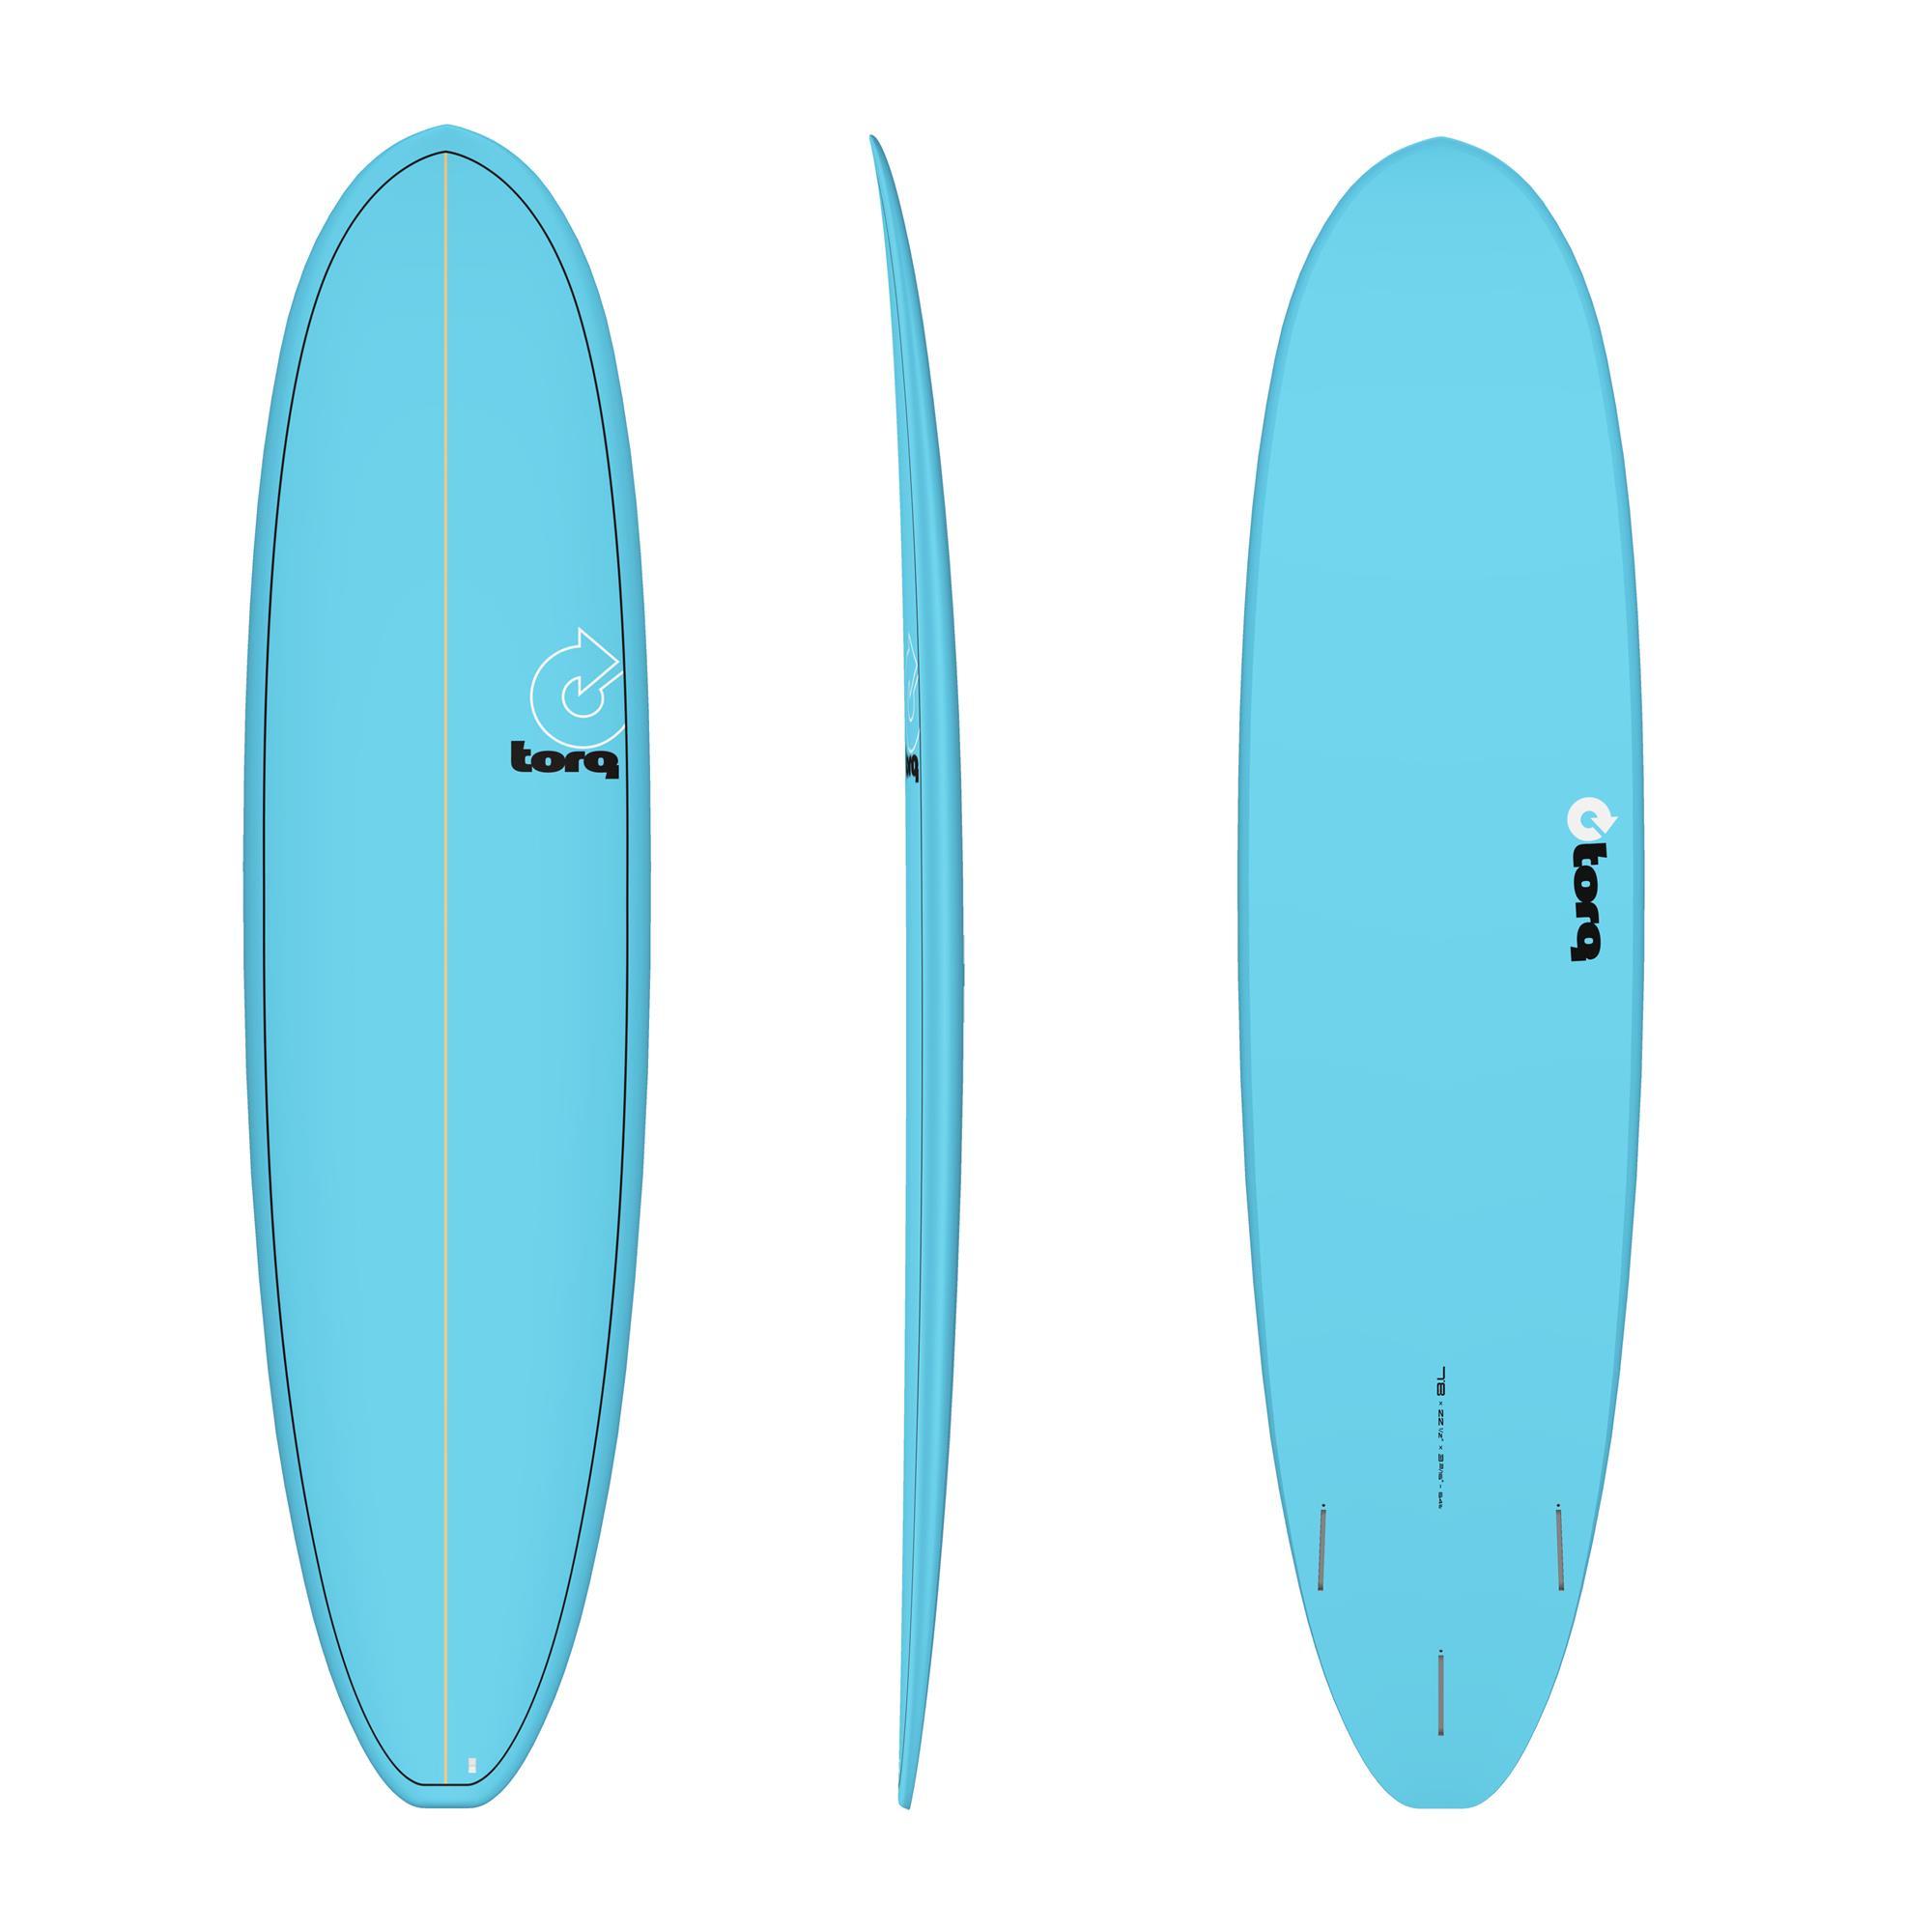 MADNESS Boardbag PE 7.2 Funboard Blau Rot f Surfboards